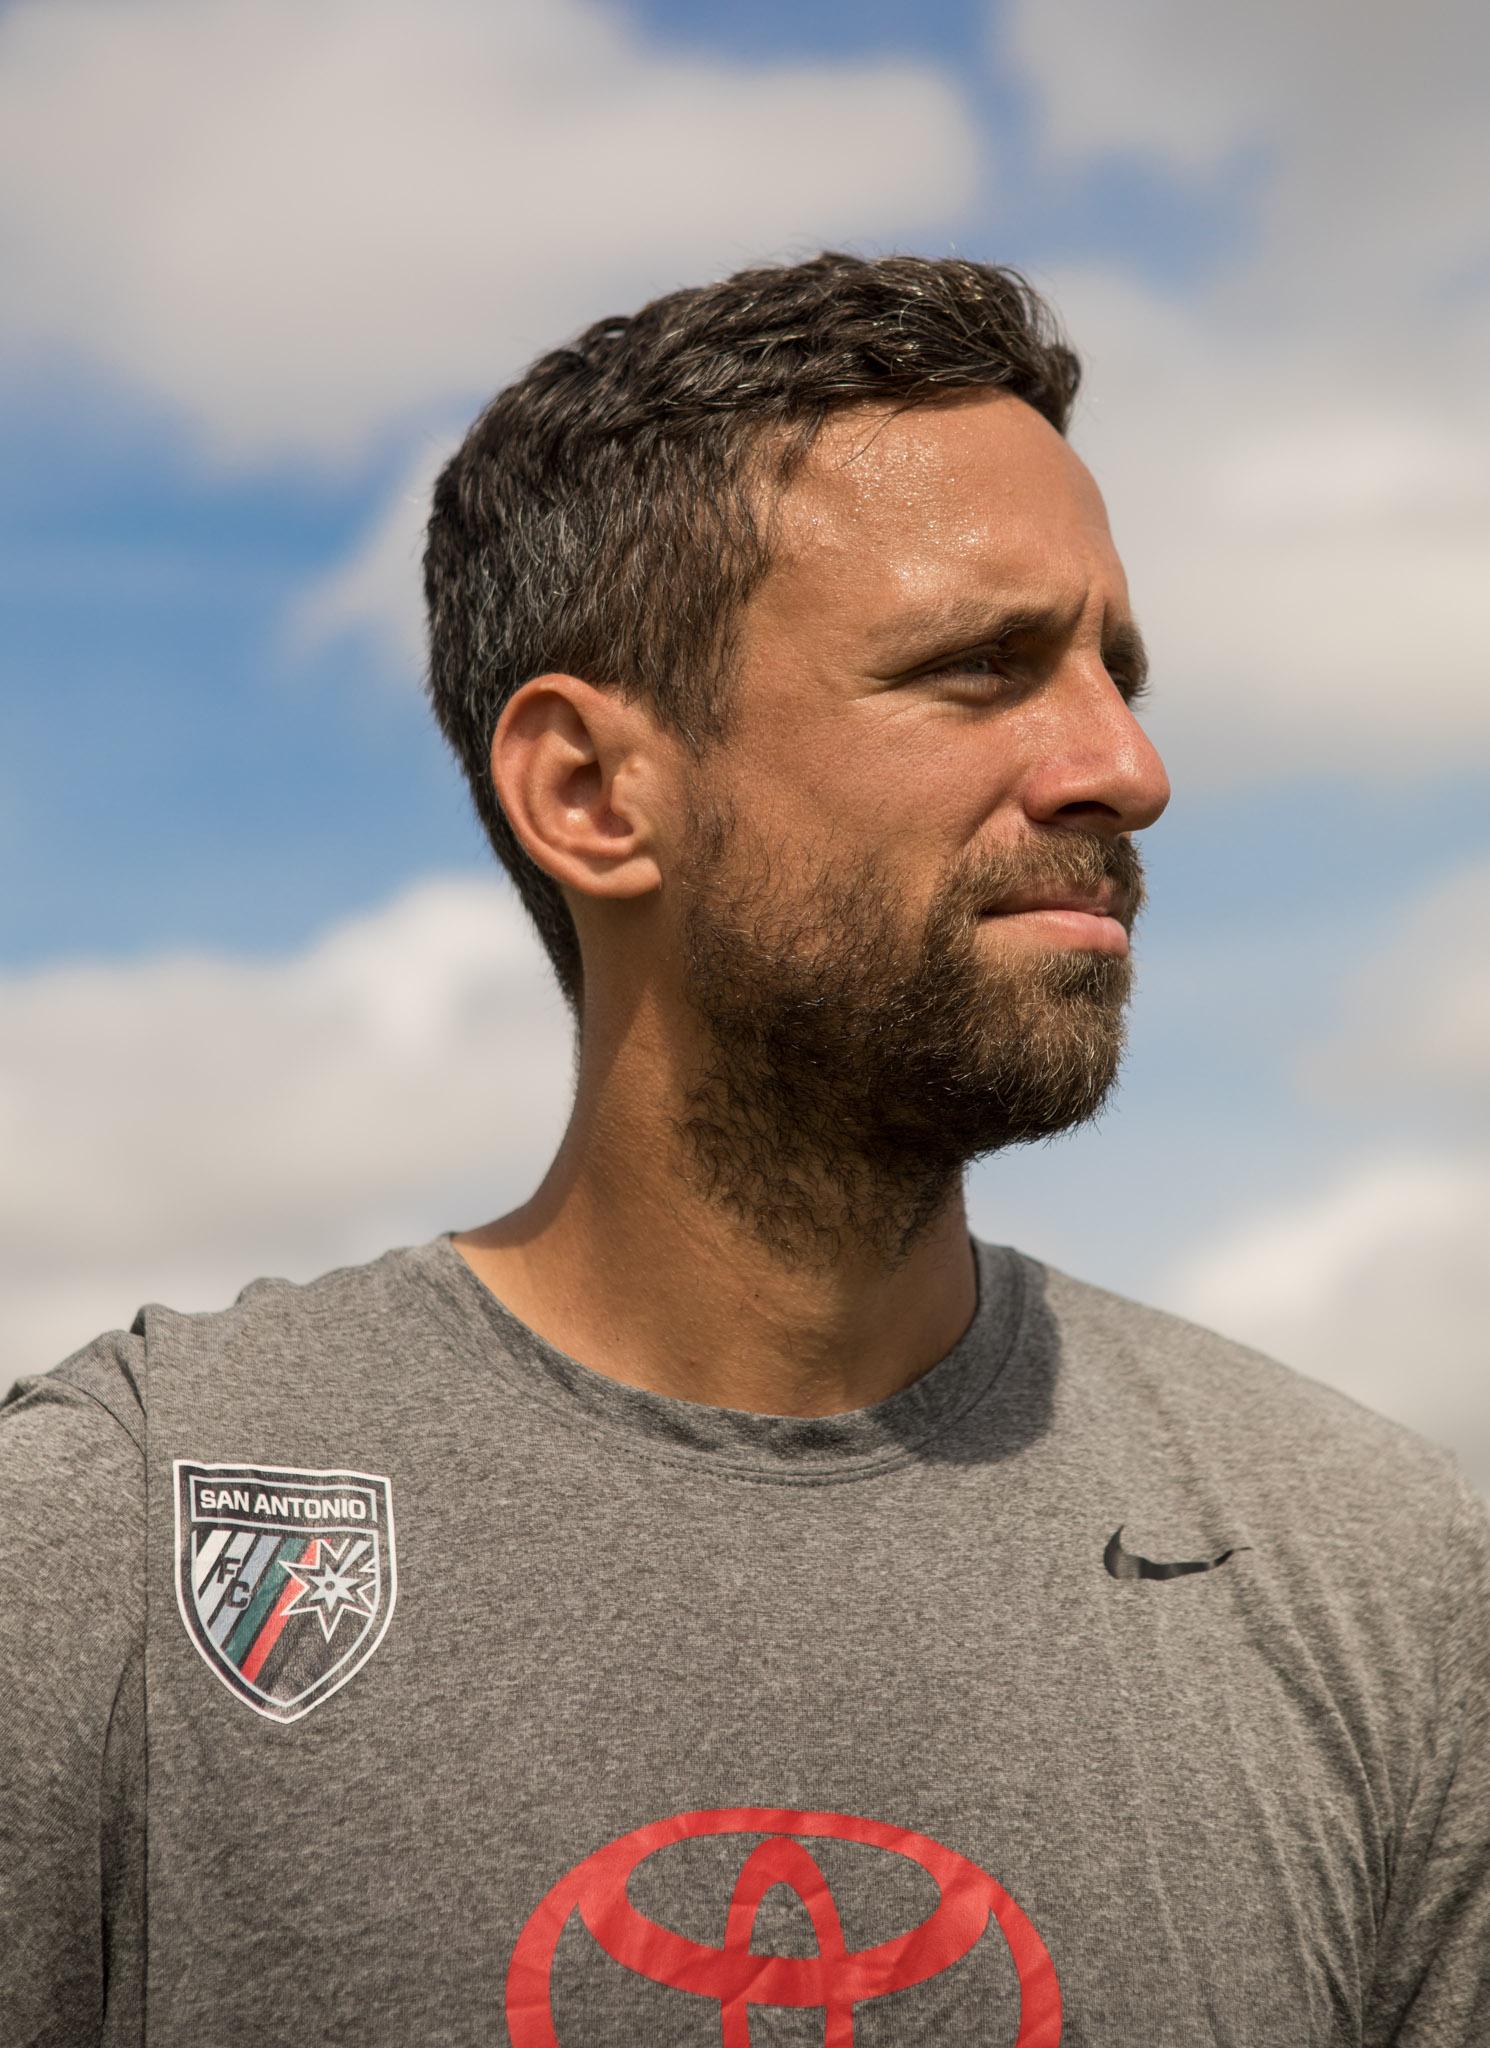 San Antonio FC's Ryan Roushandel.